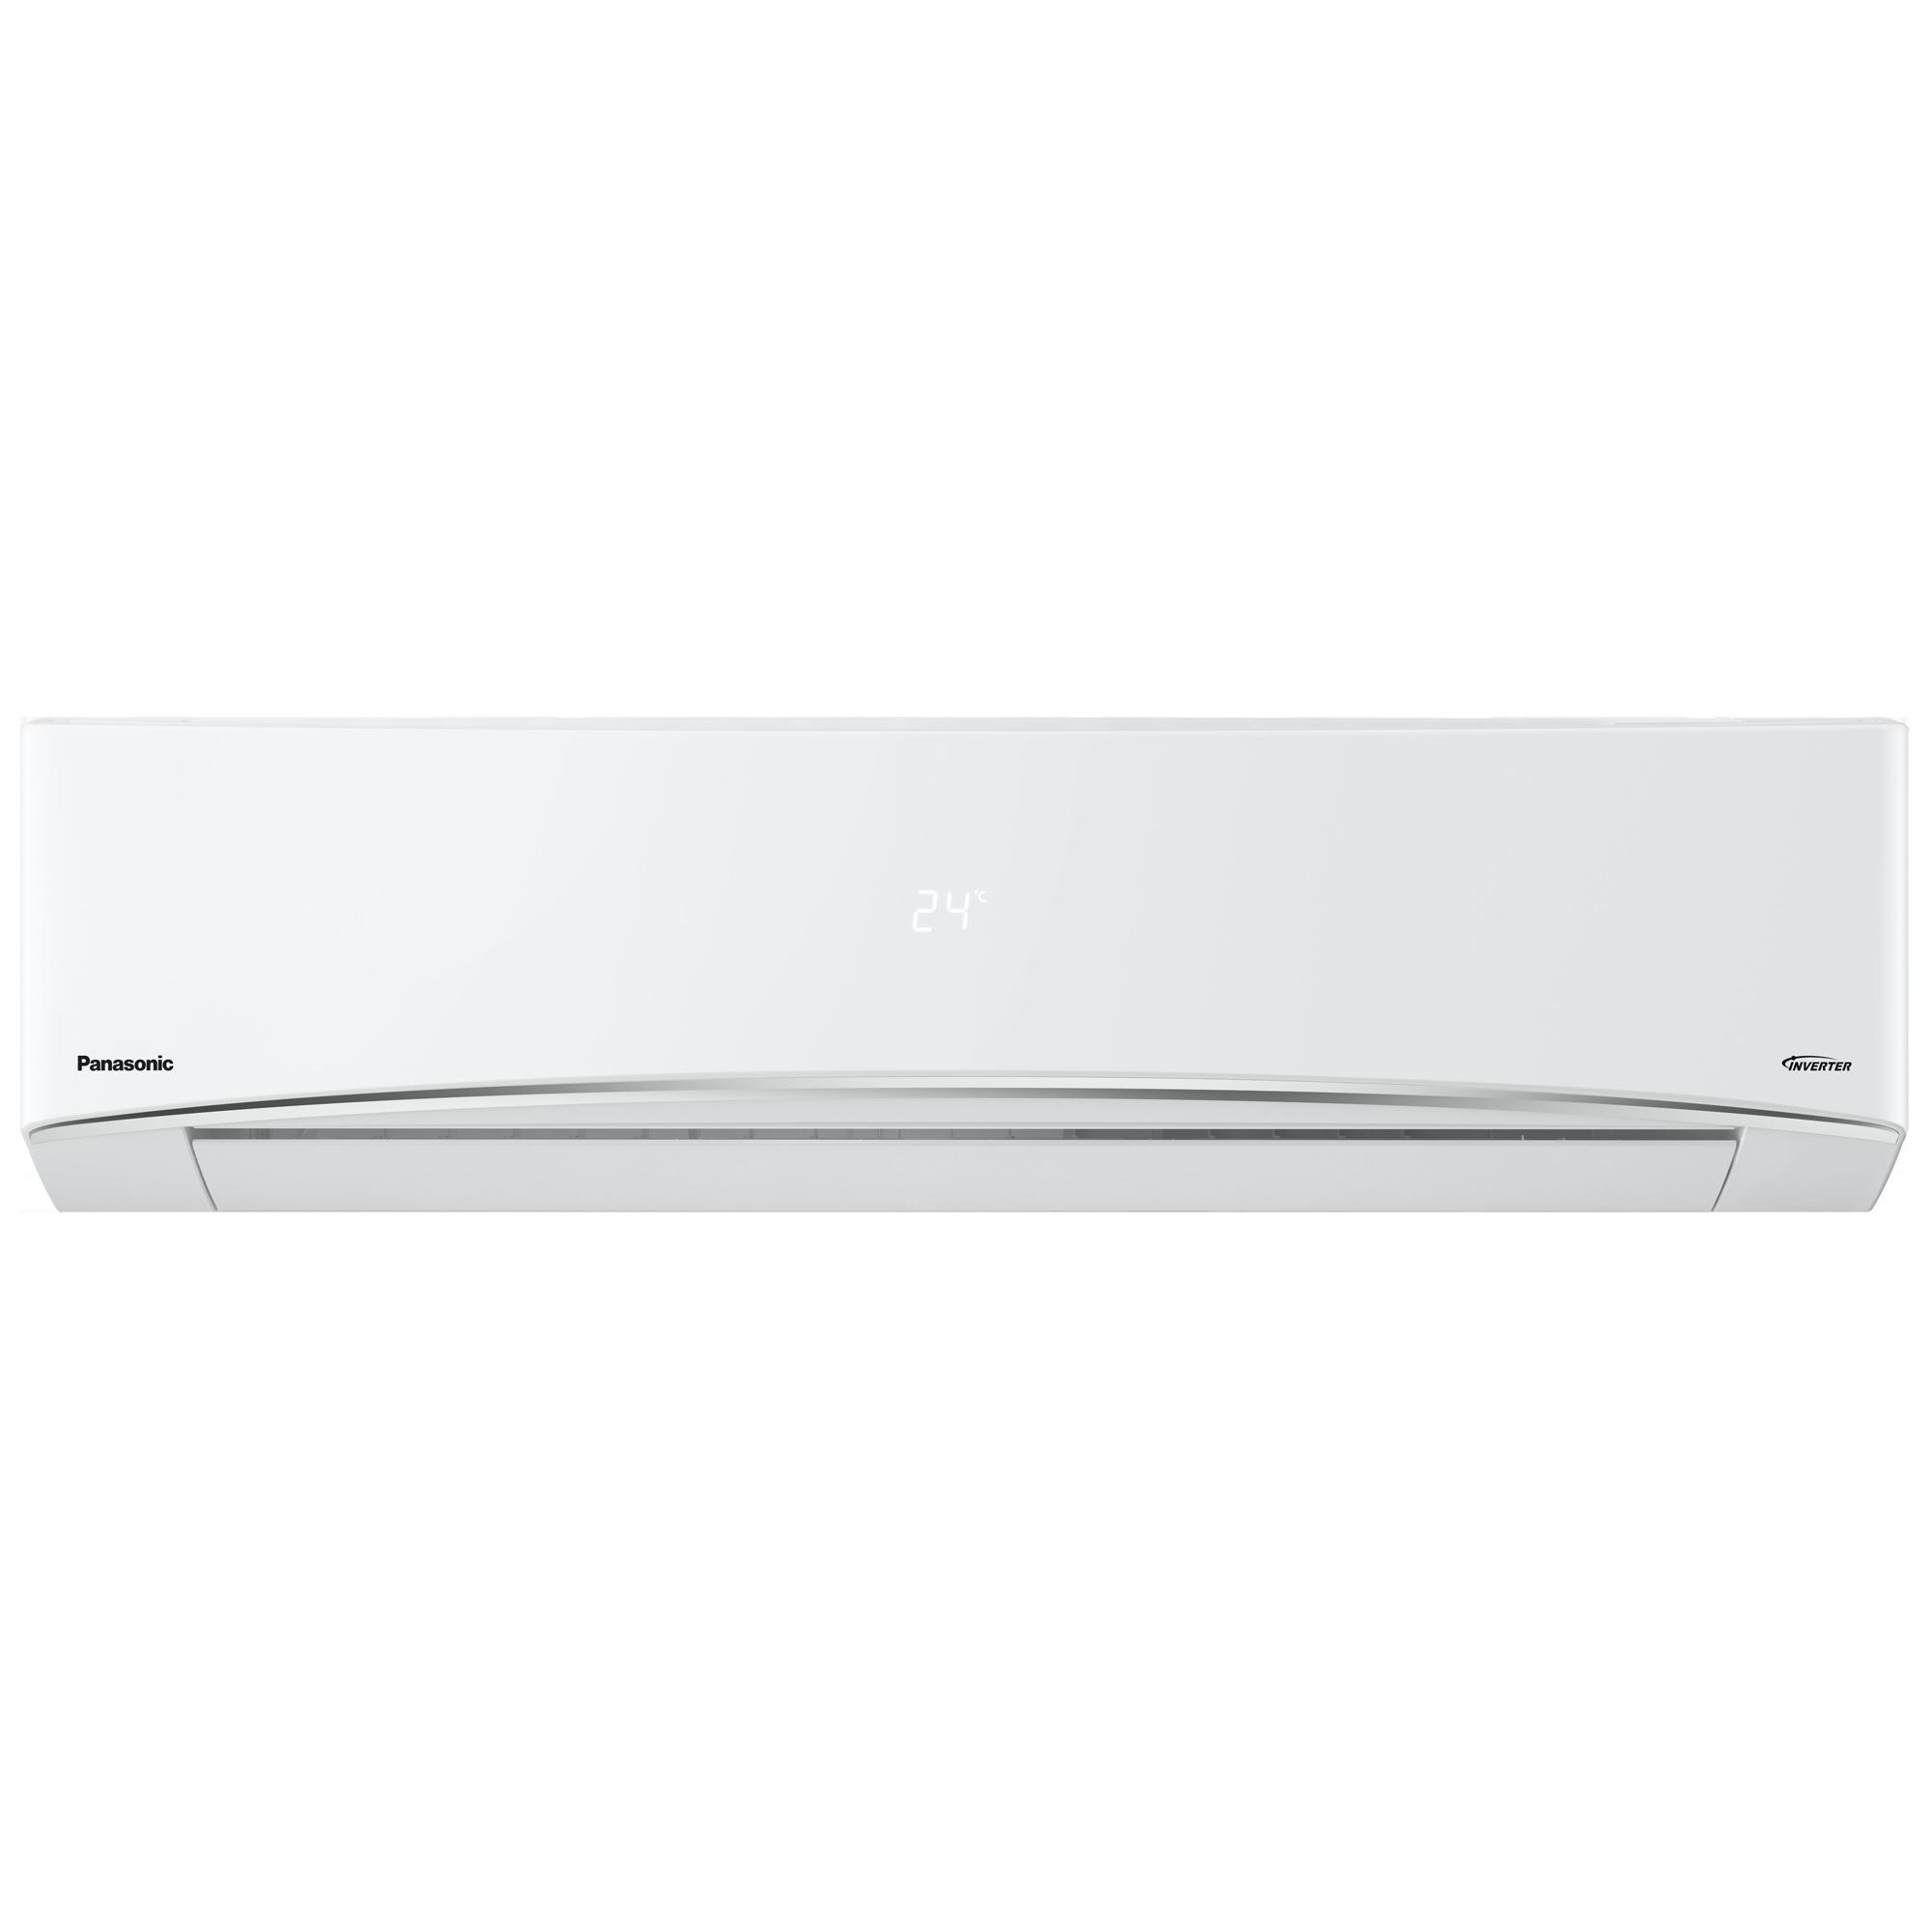 Panasonic KU 1.5 Ton 3 Star Inverter Split AC (Air Purification Filter, Copper Condenser, CS/CU-KU18XKYF1, White)_1